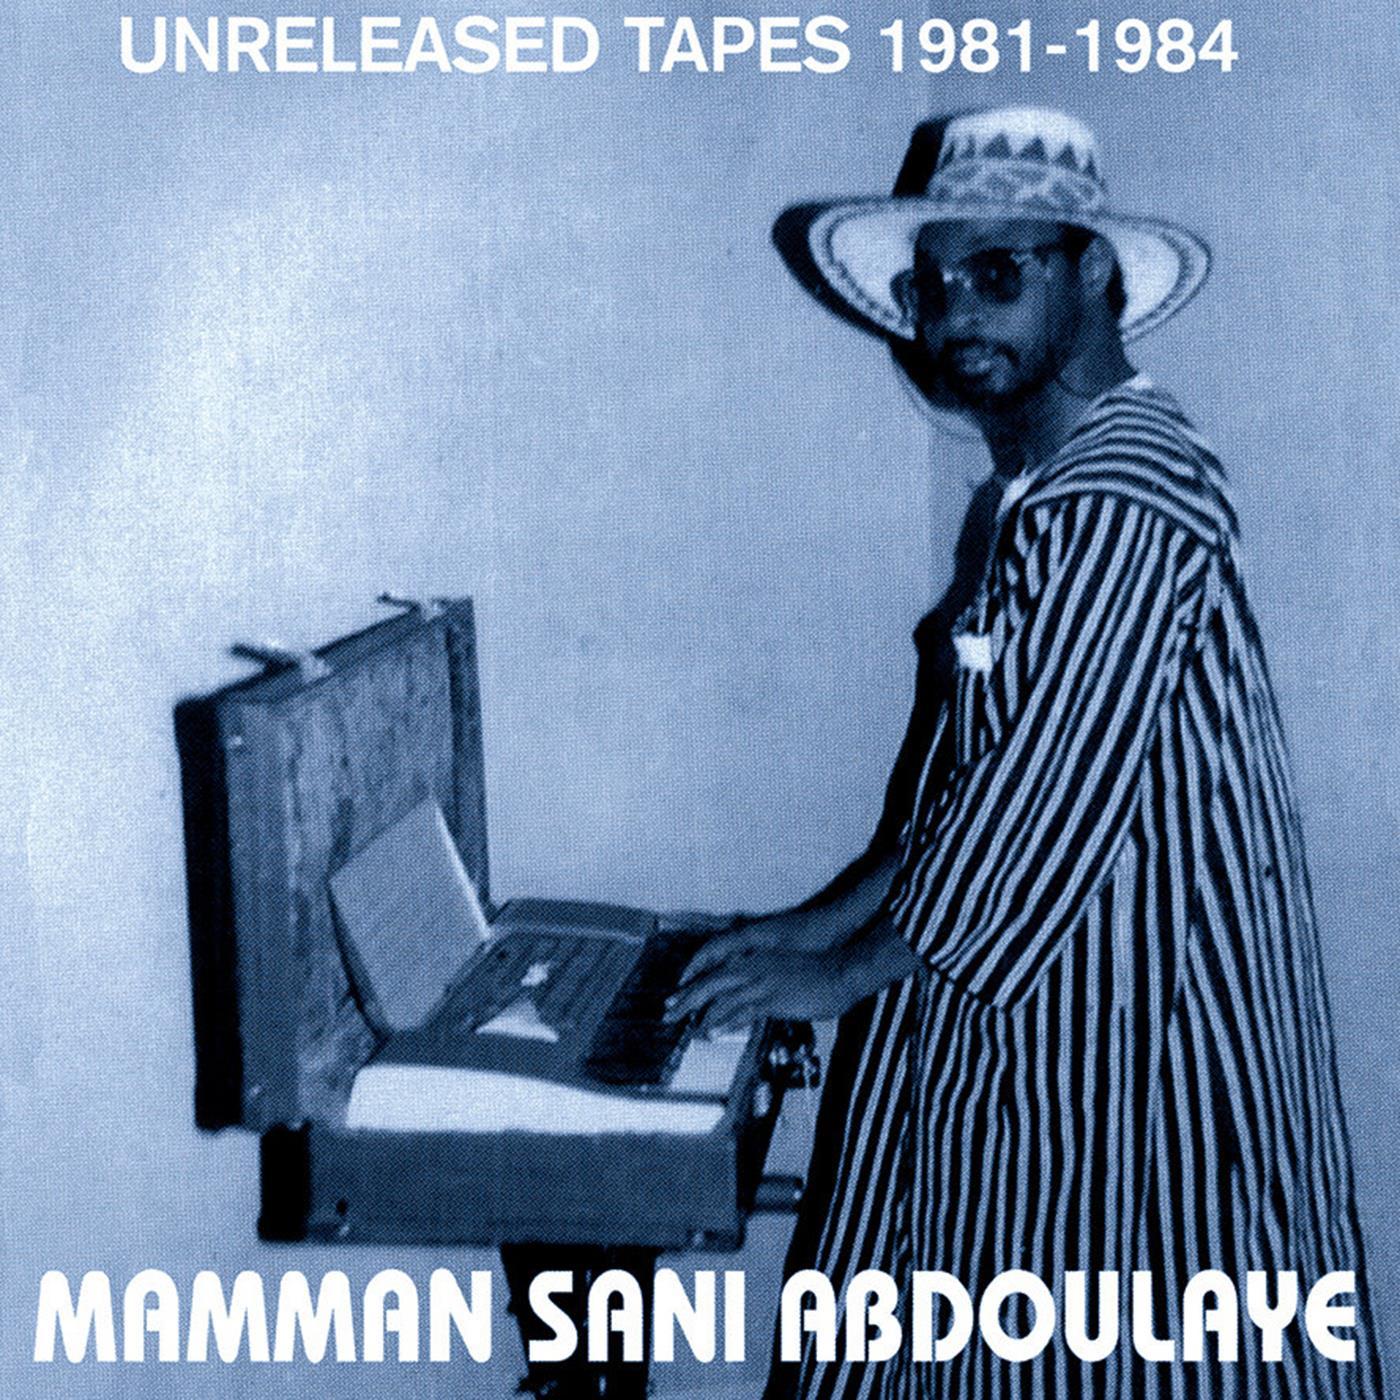 Mamman Sani - Unreleased Tapes 1981-1984 [LP]